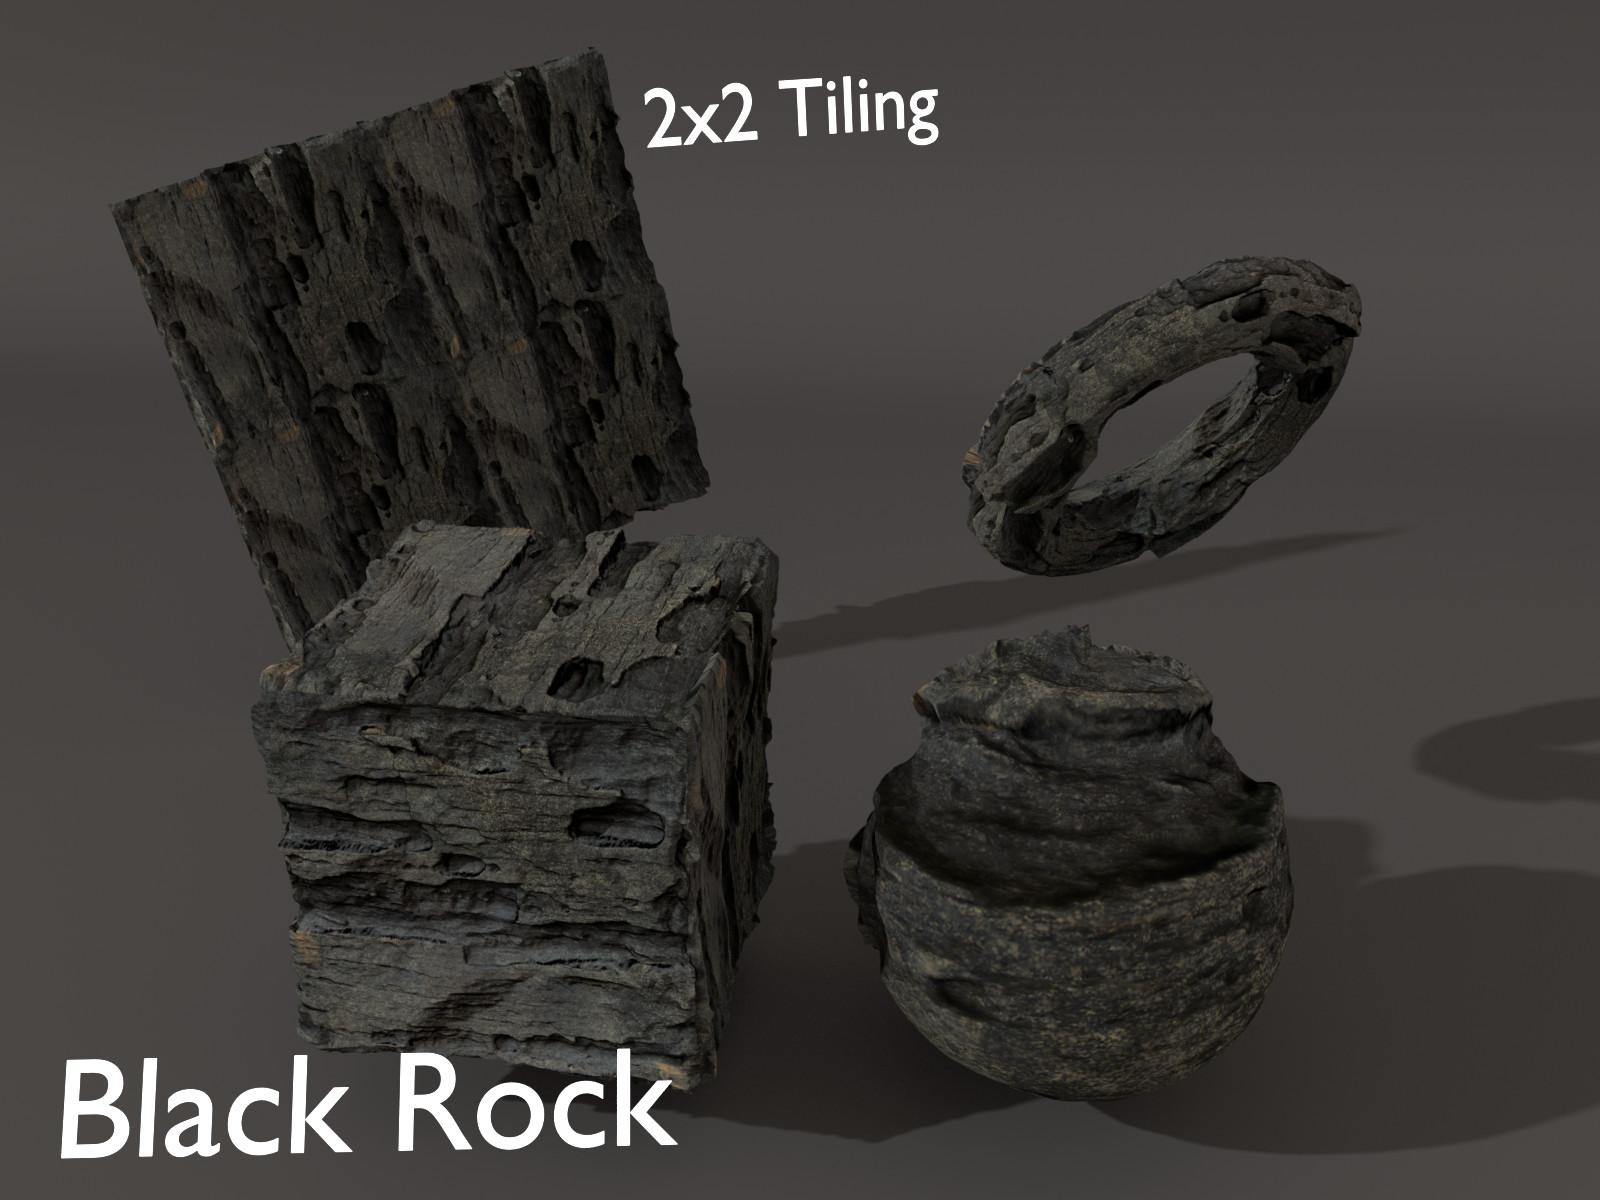 Sieben corgie blackrock p